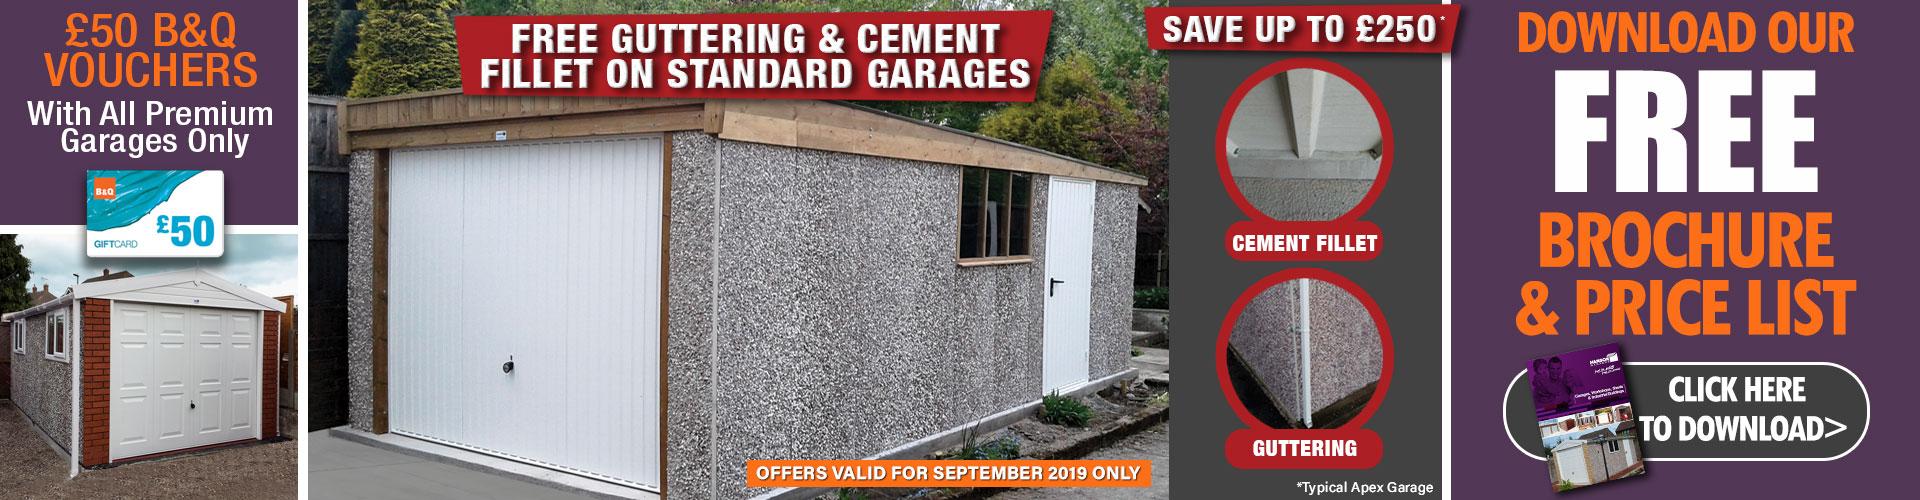 Concrete garages offers